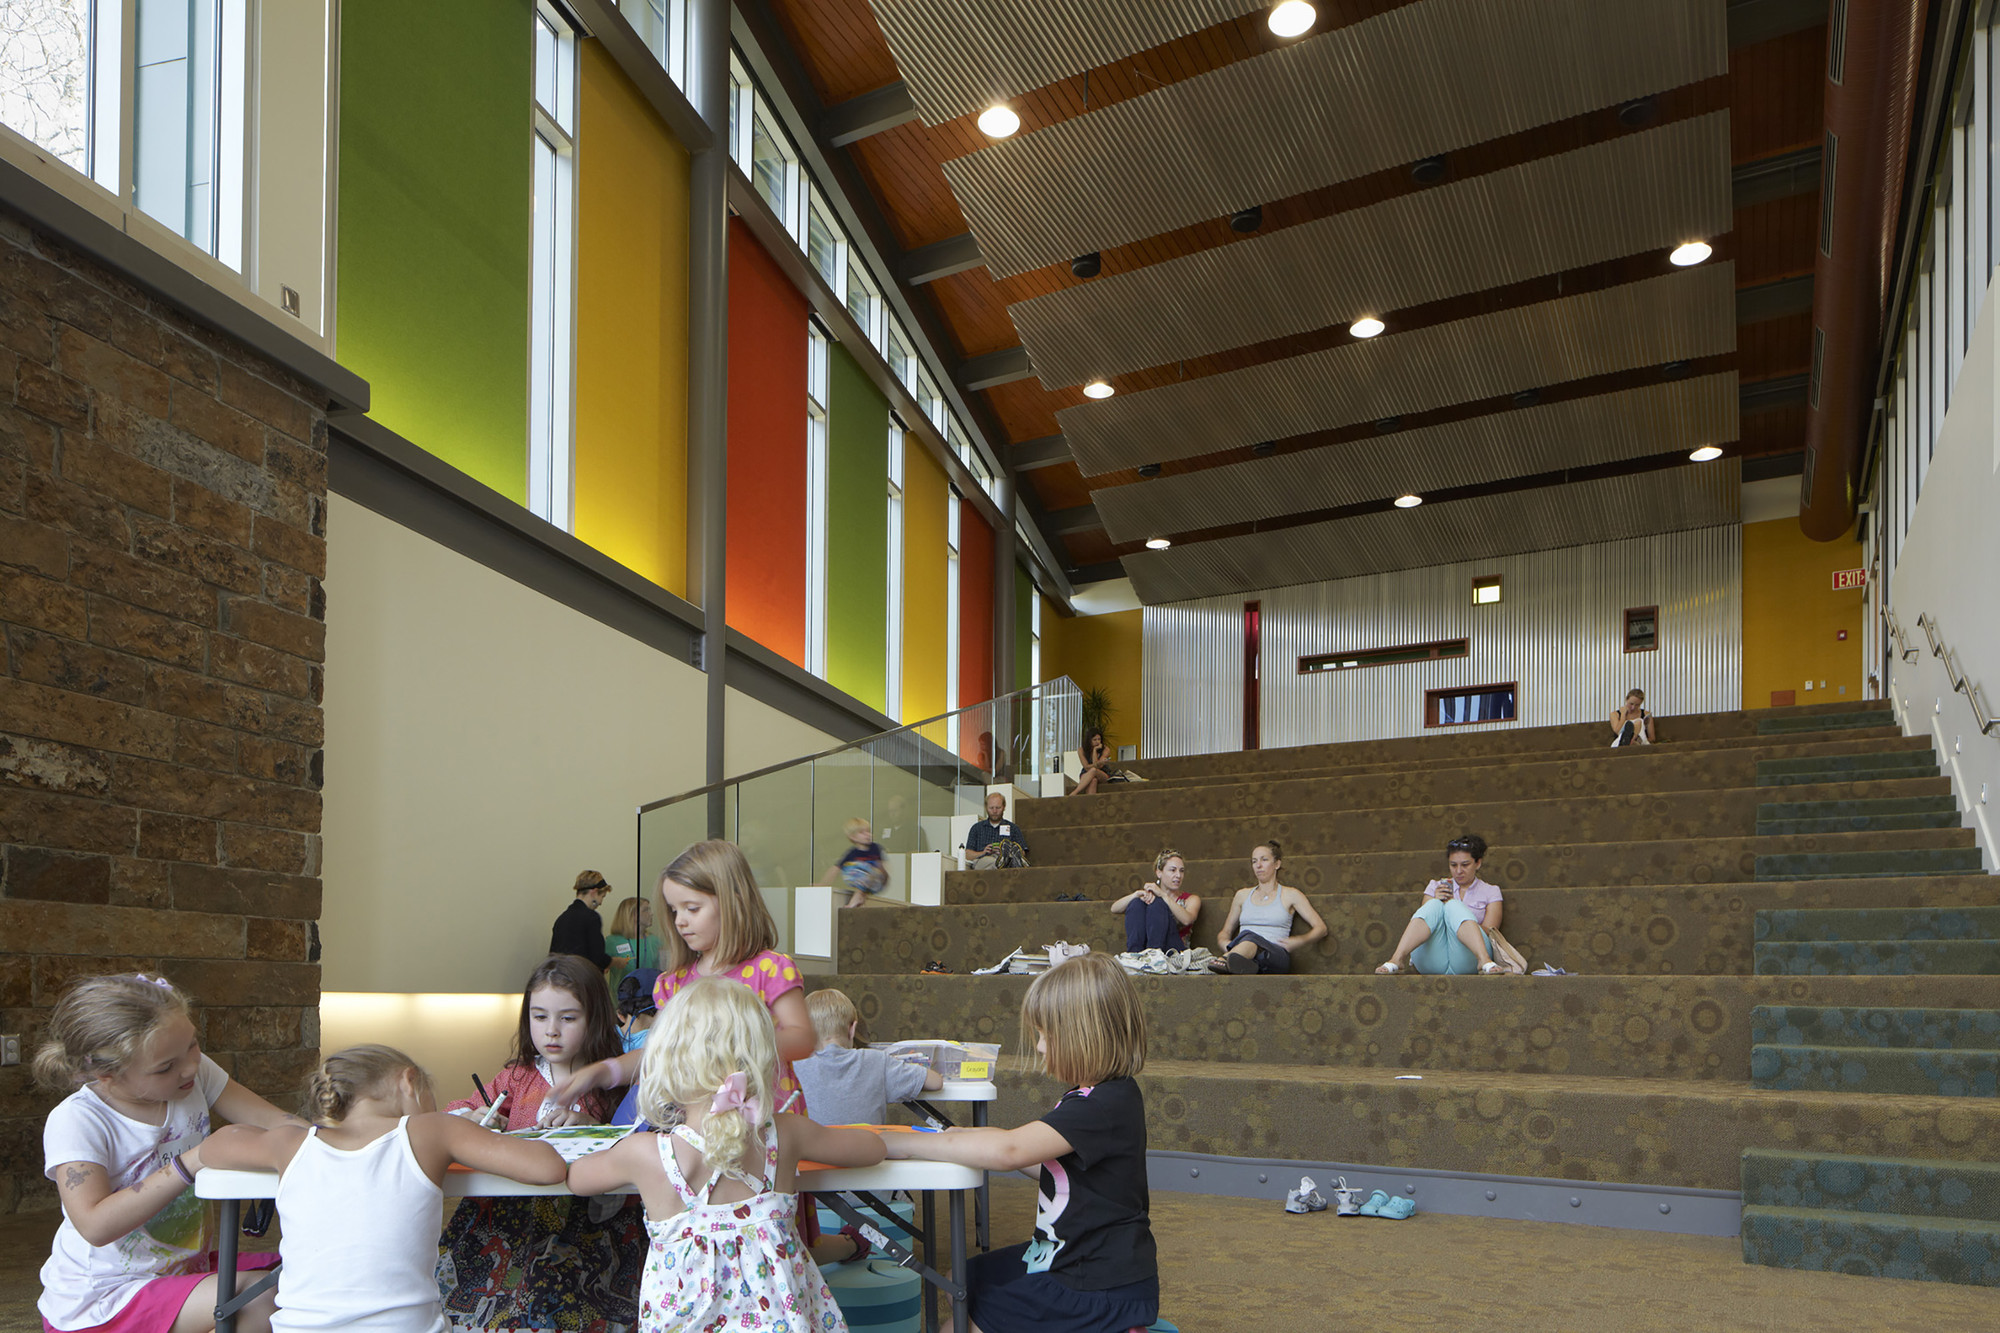 CALS Childrens Library Polk Stanley Wilcox Architects